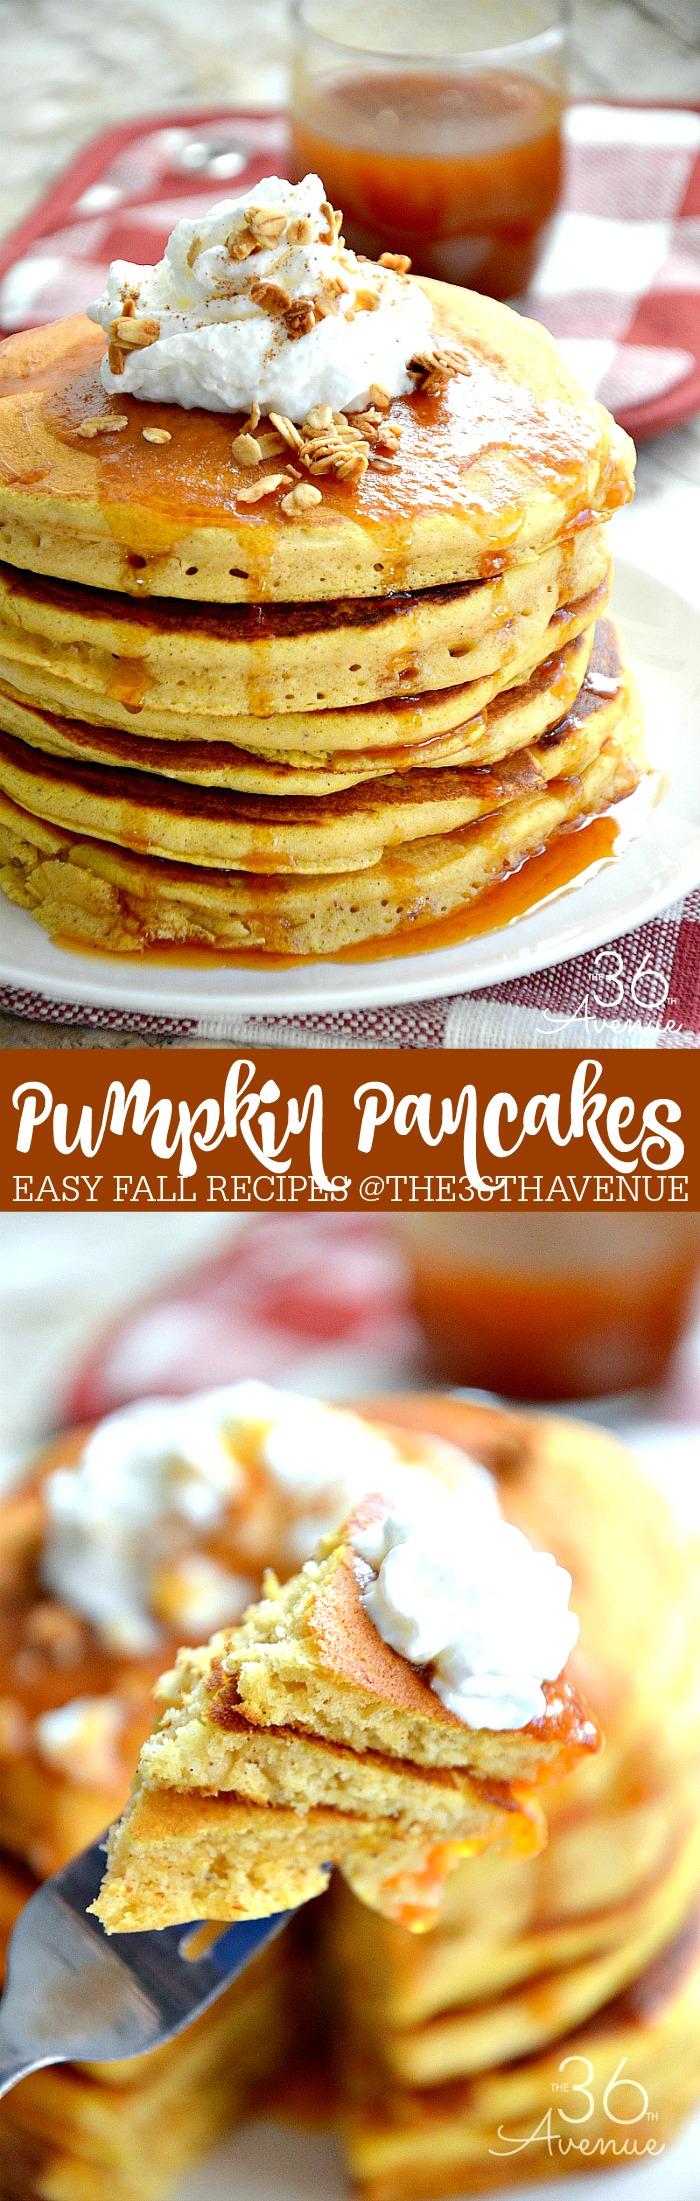 pumpkin-pancakes-at-the36thavenue-com